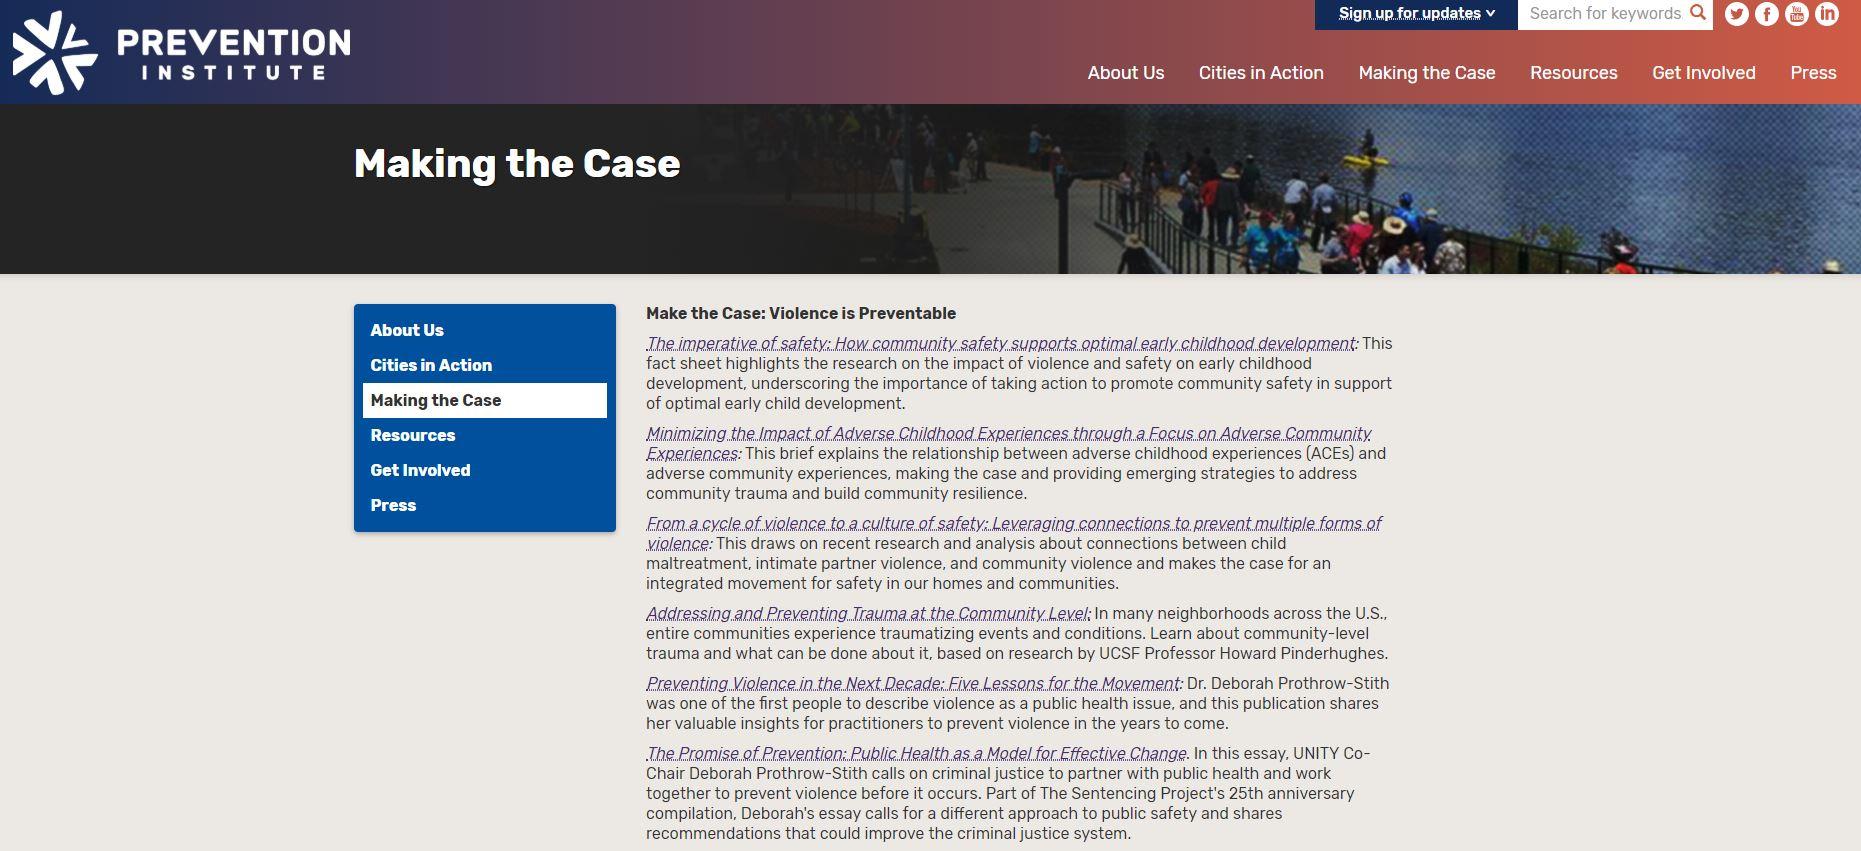 Make the Case: Violence is Preventable